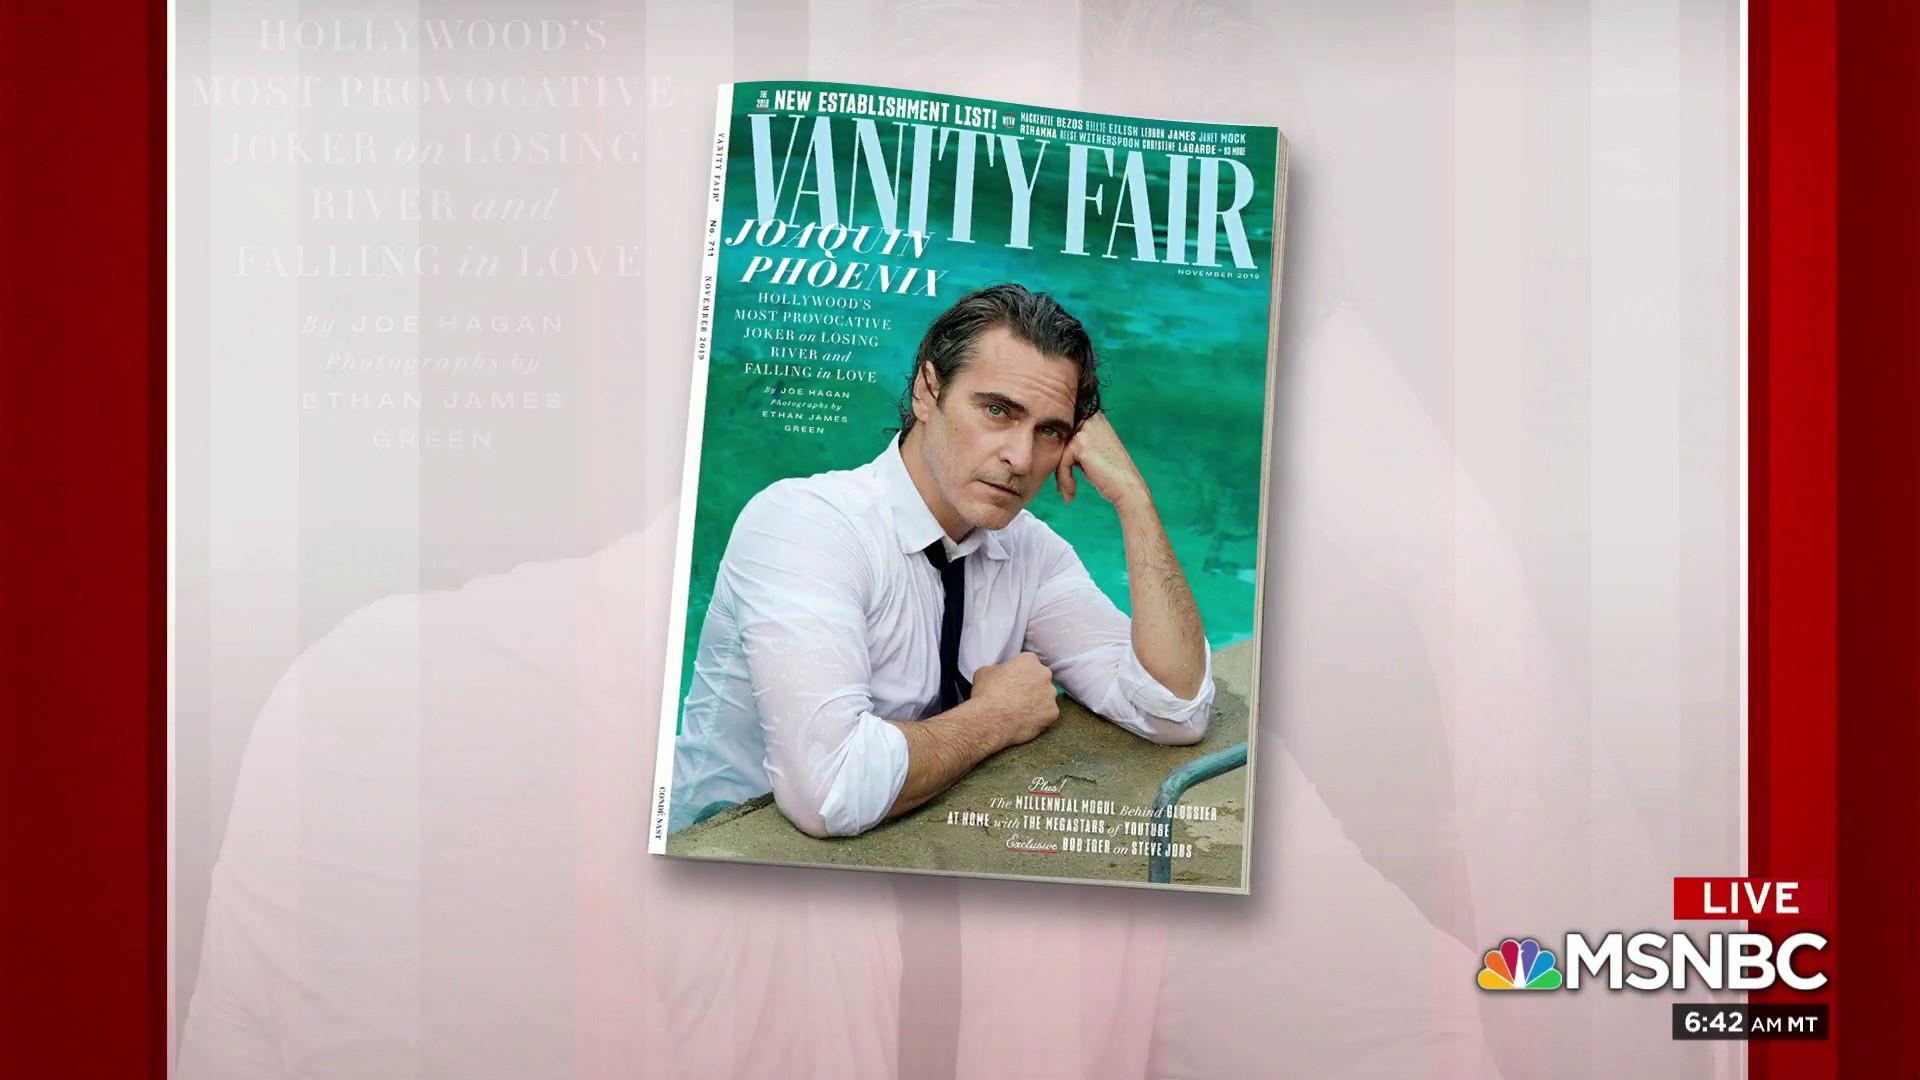 Vanity Fair releases its 2019 New Establishment List